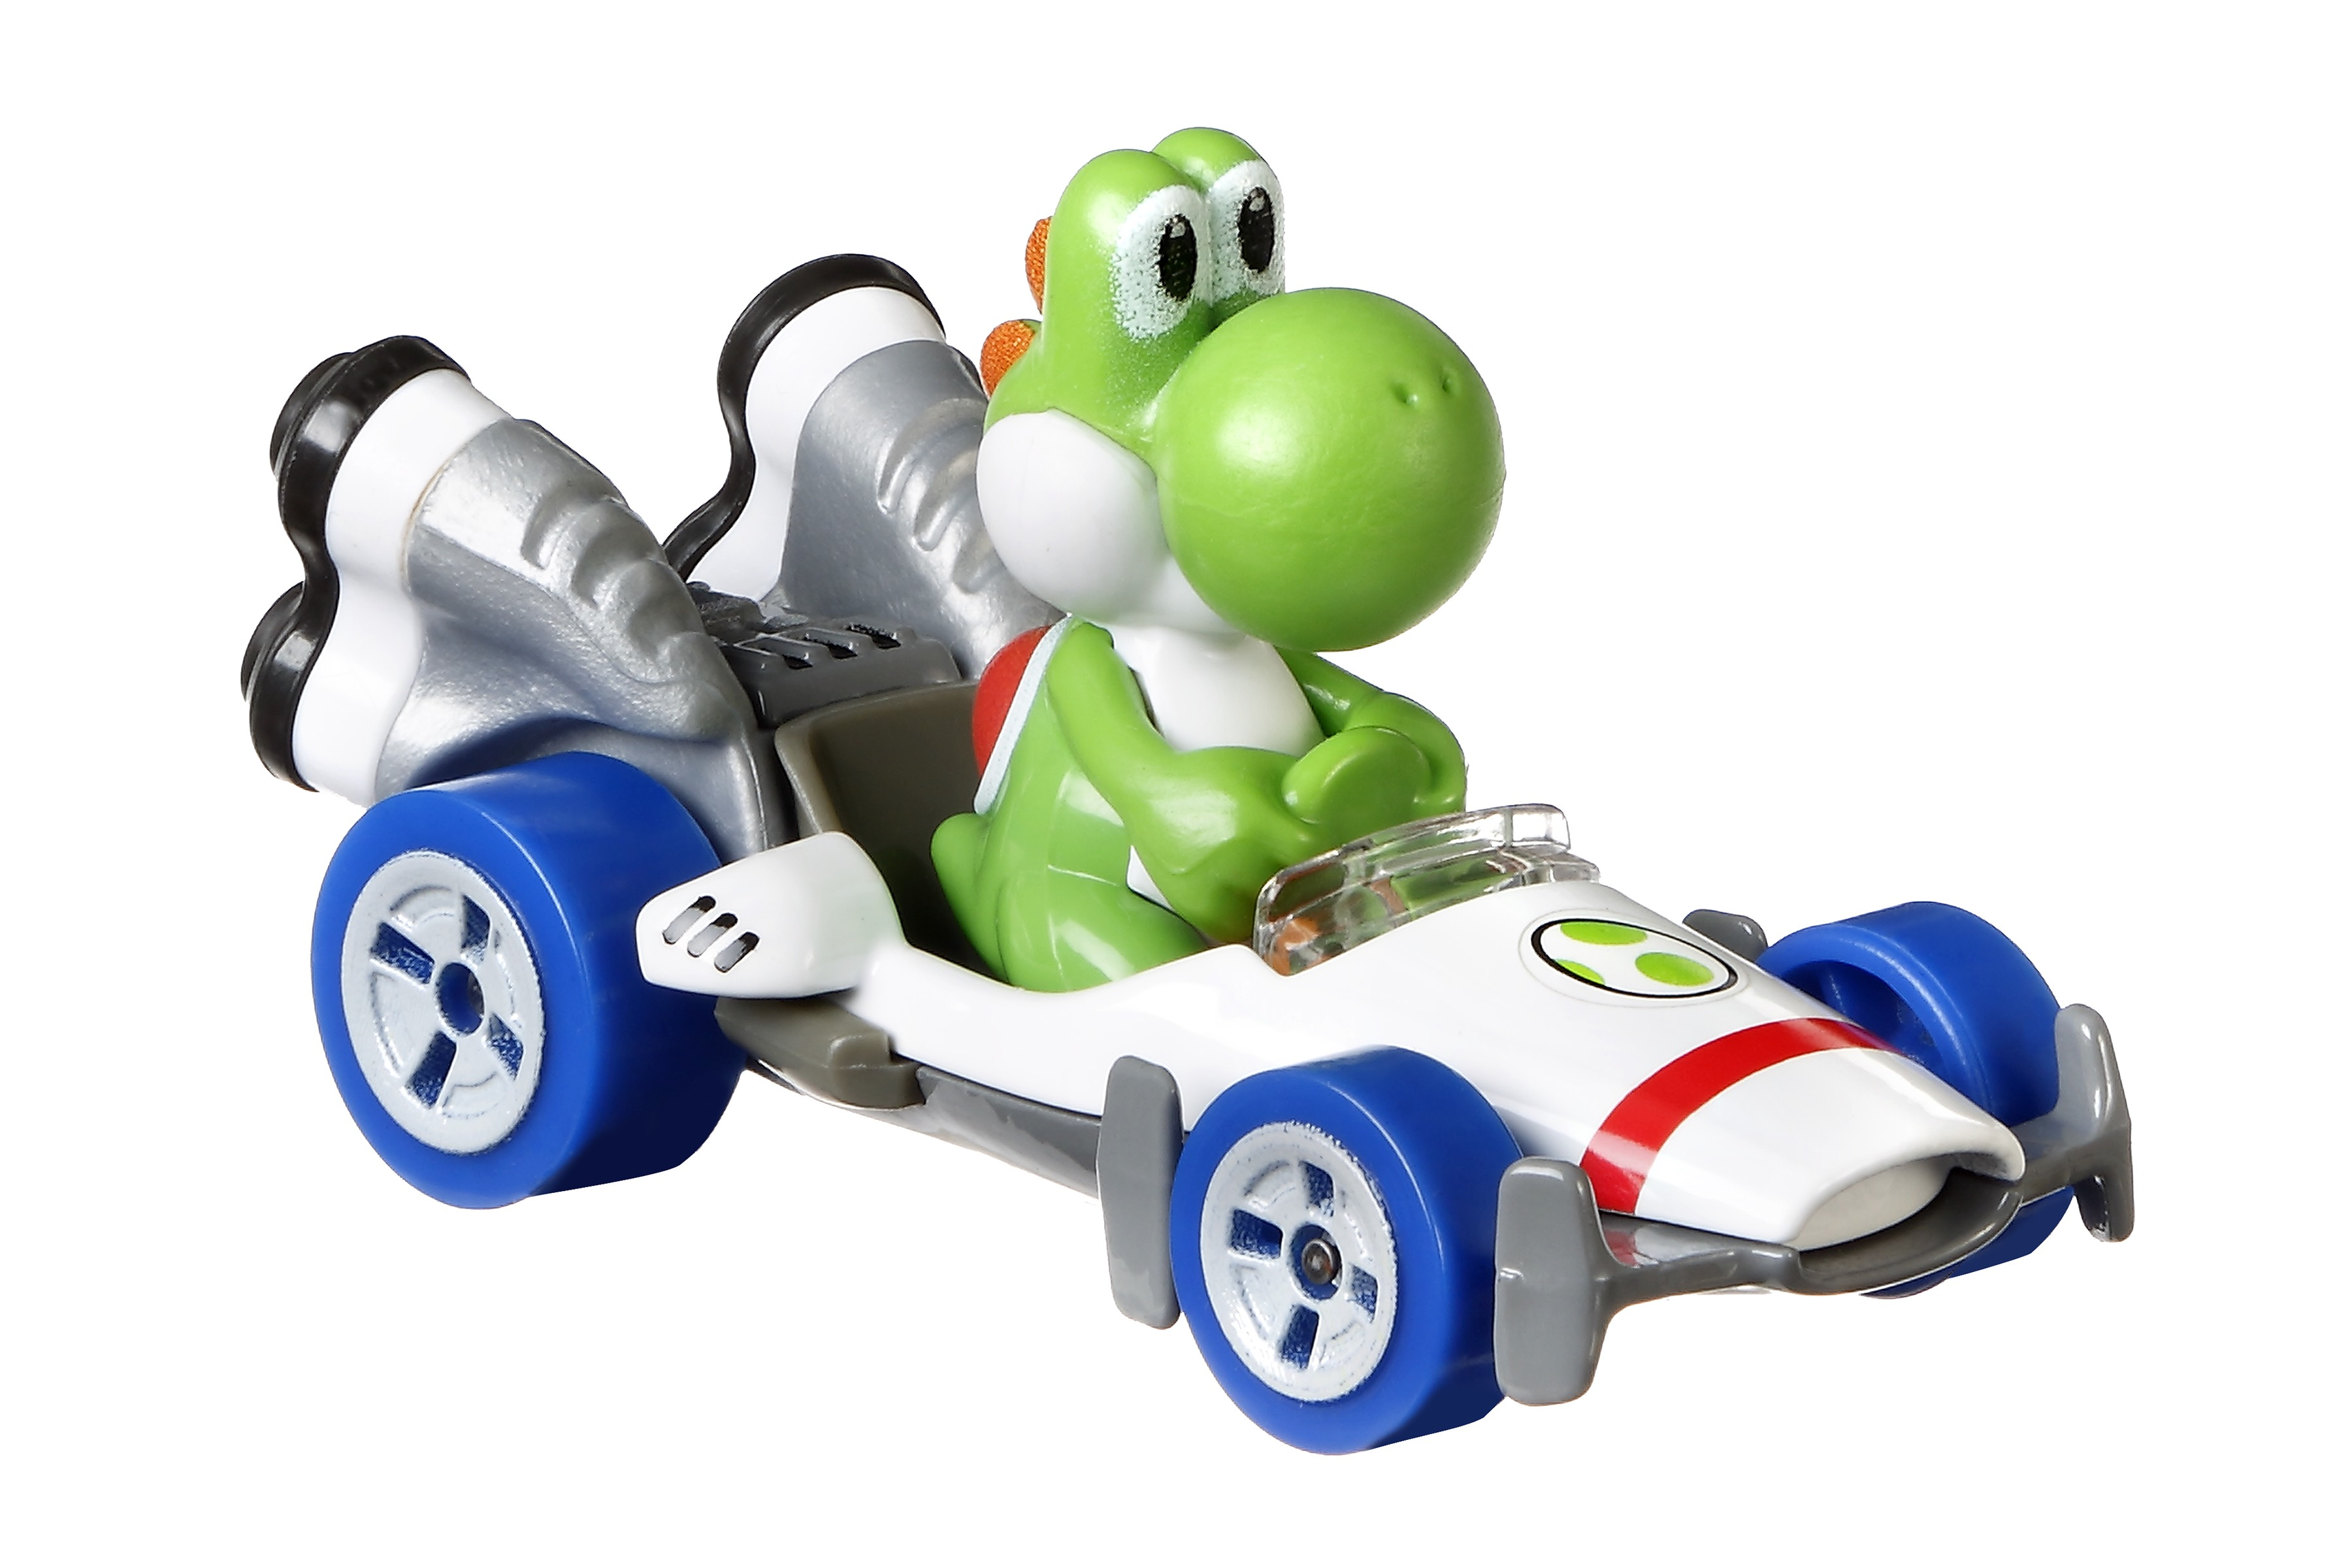 Hot Wheels Yoshi die-cast